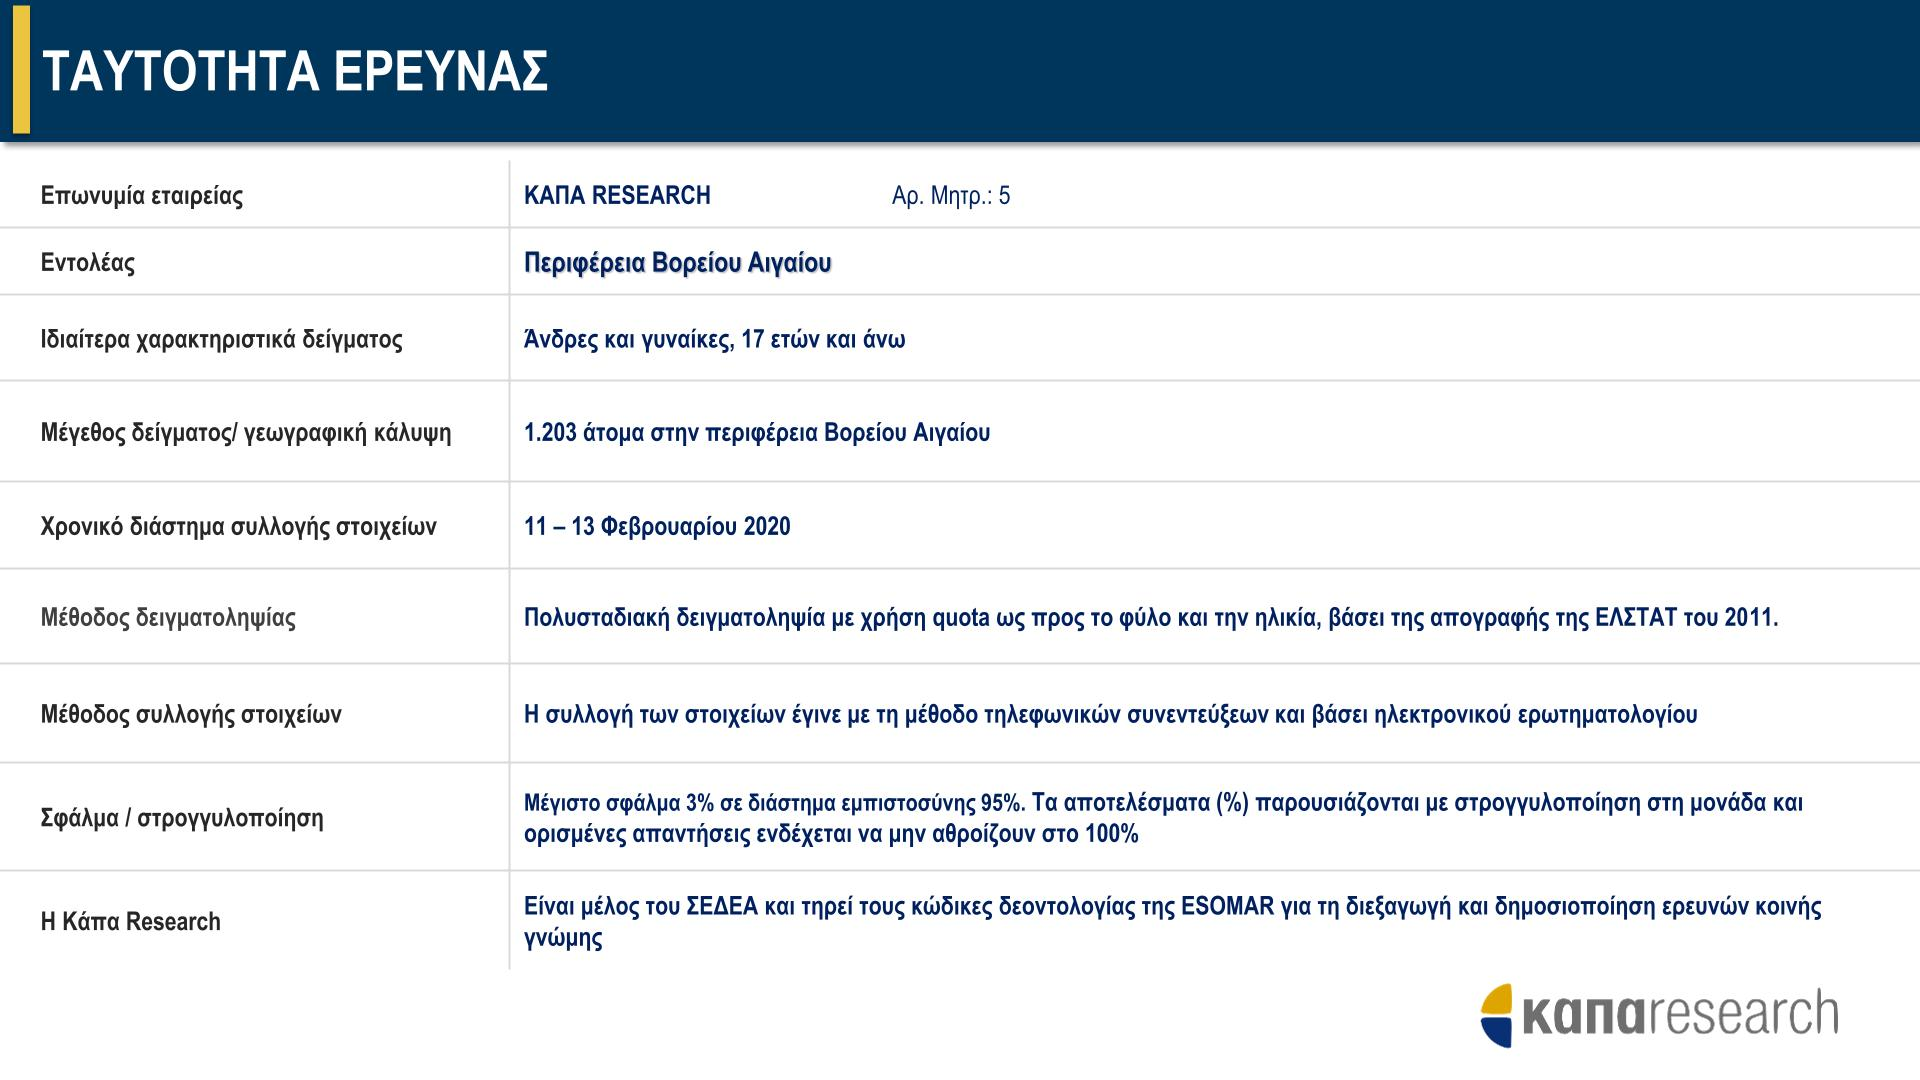 https://www.iefimerida.gr/sites/default/files/inline-images/kapa-research-taytotita.jpg